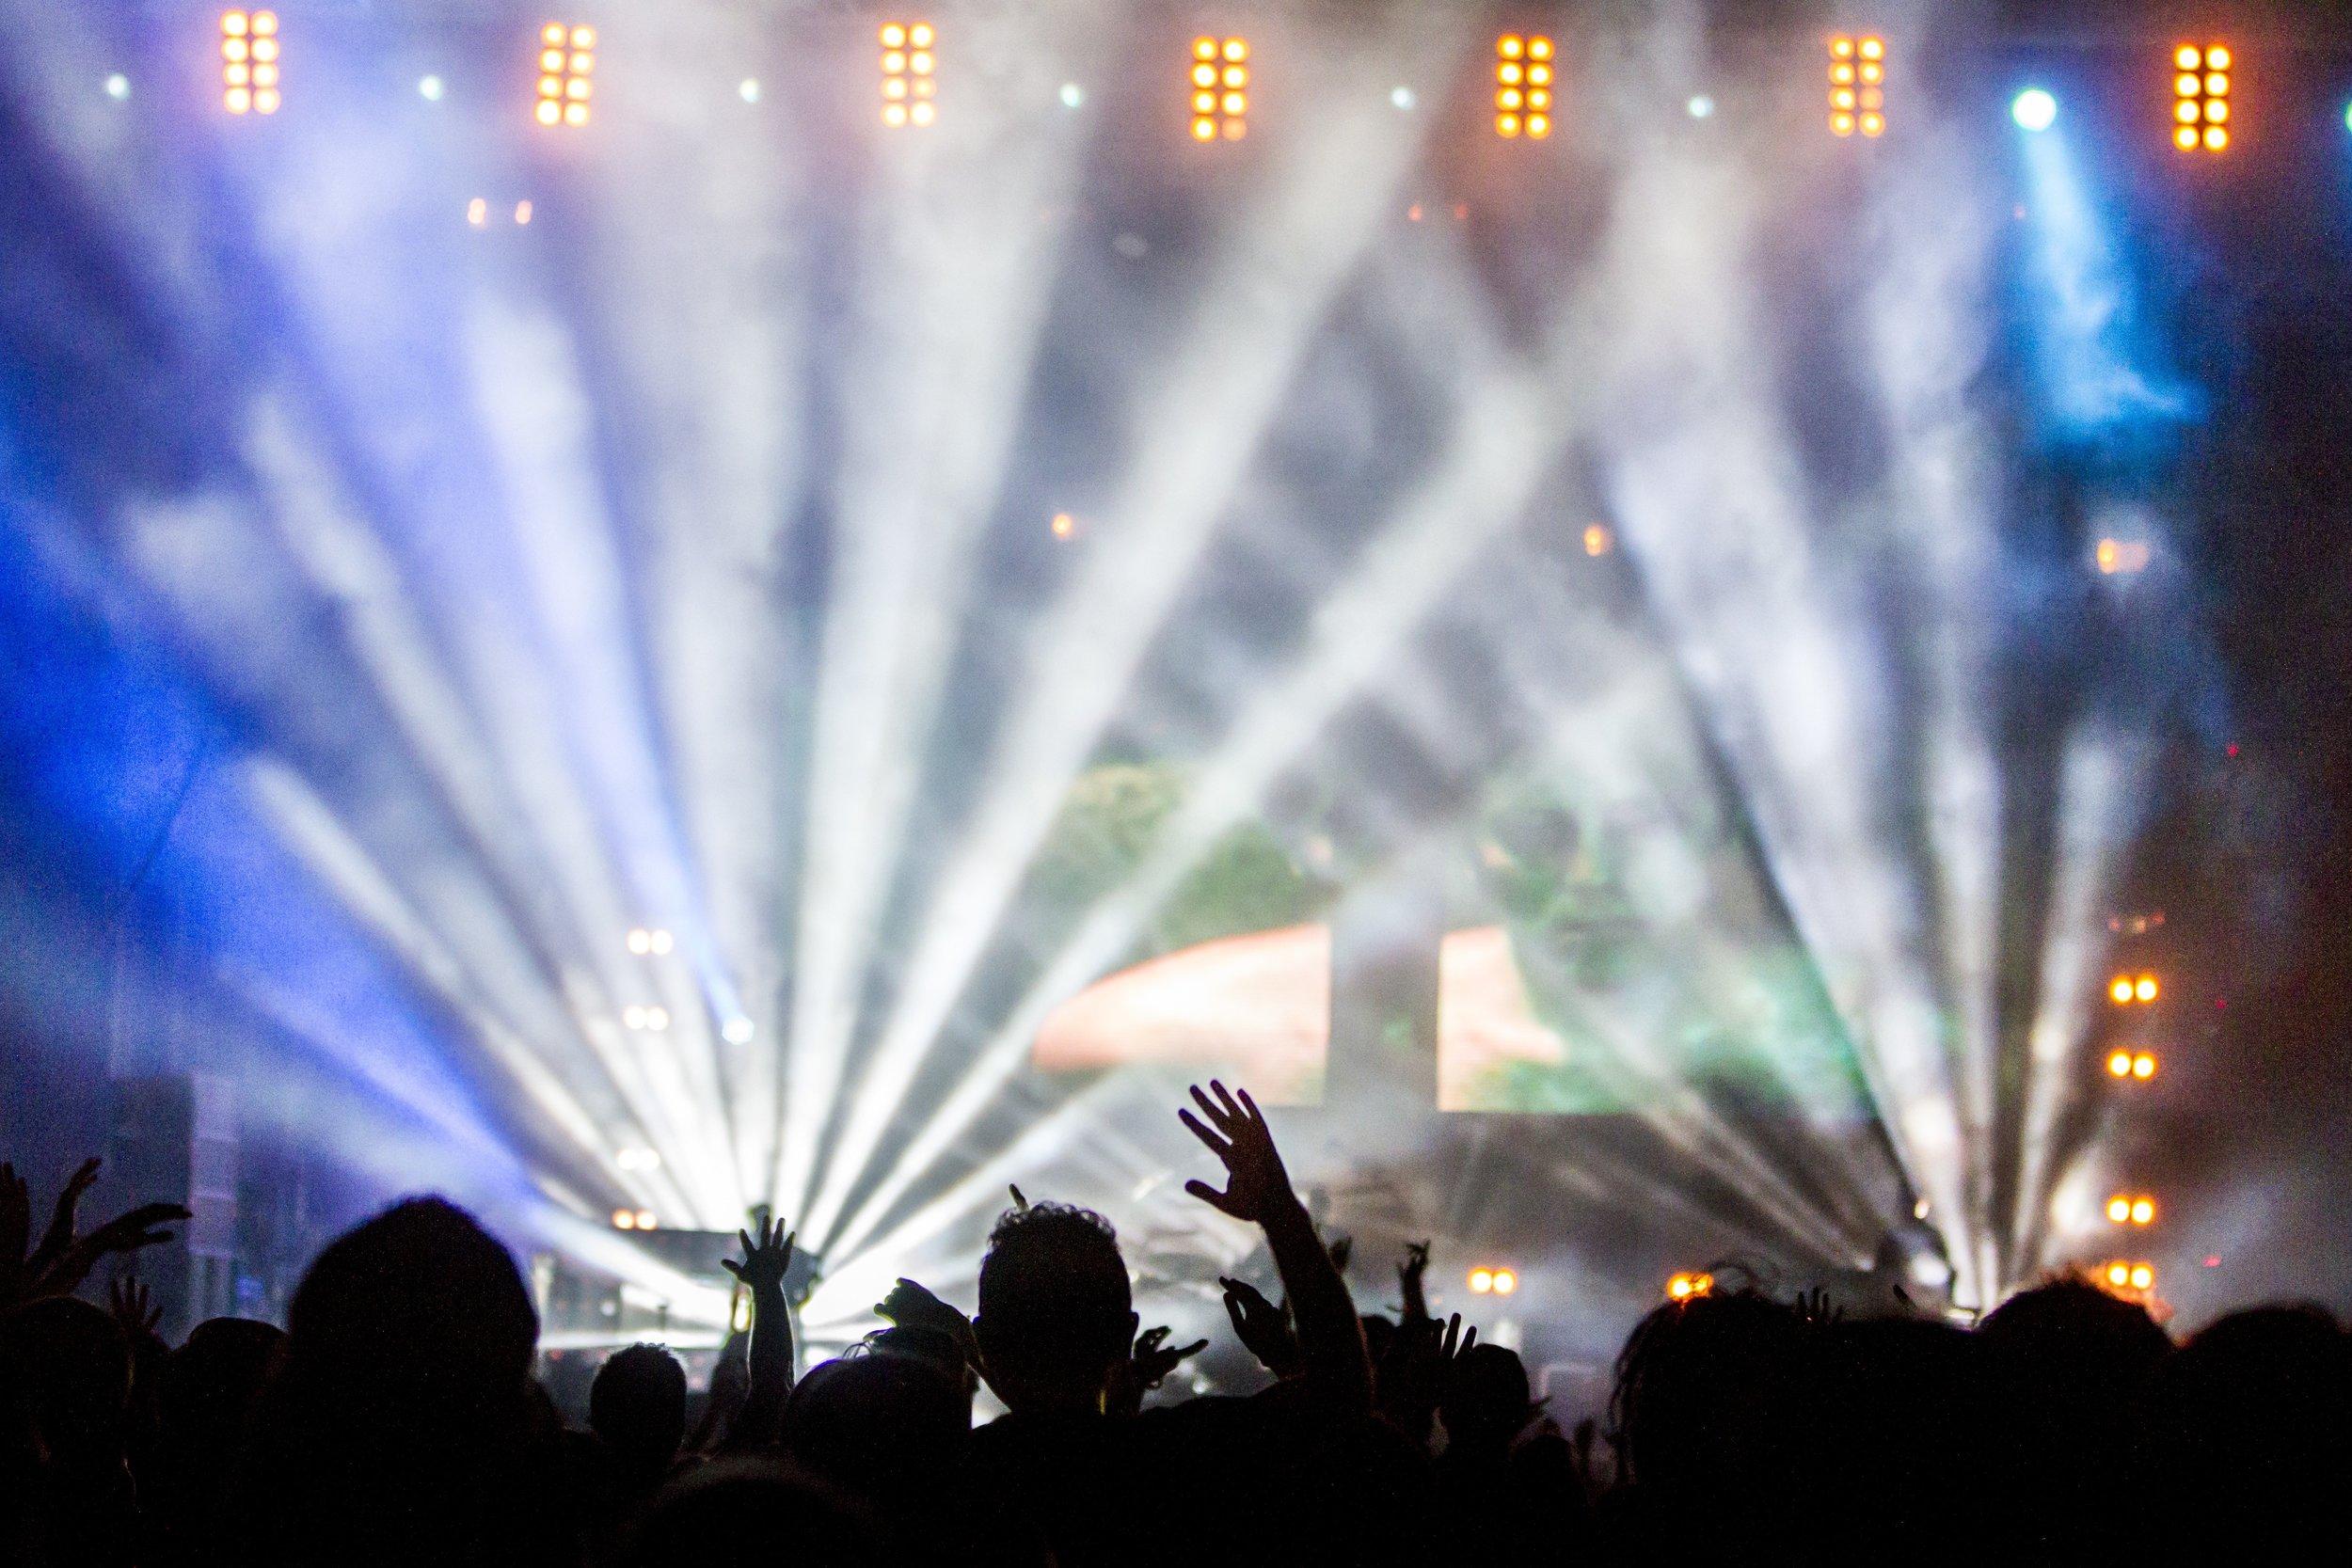 concert-336695.jpg